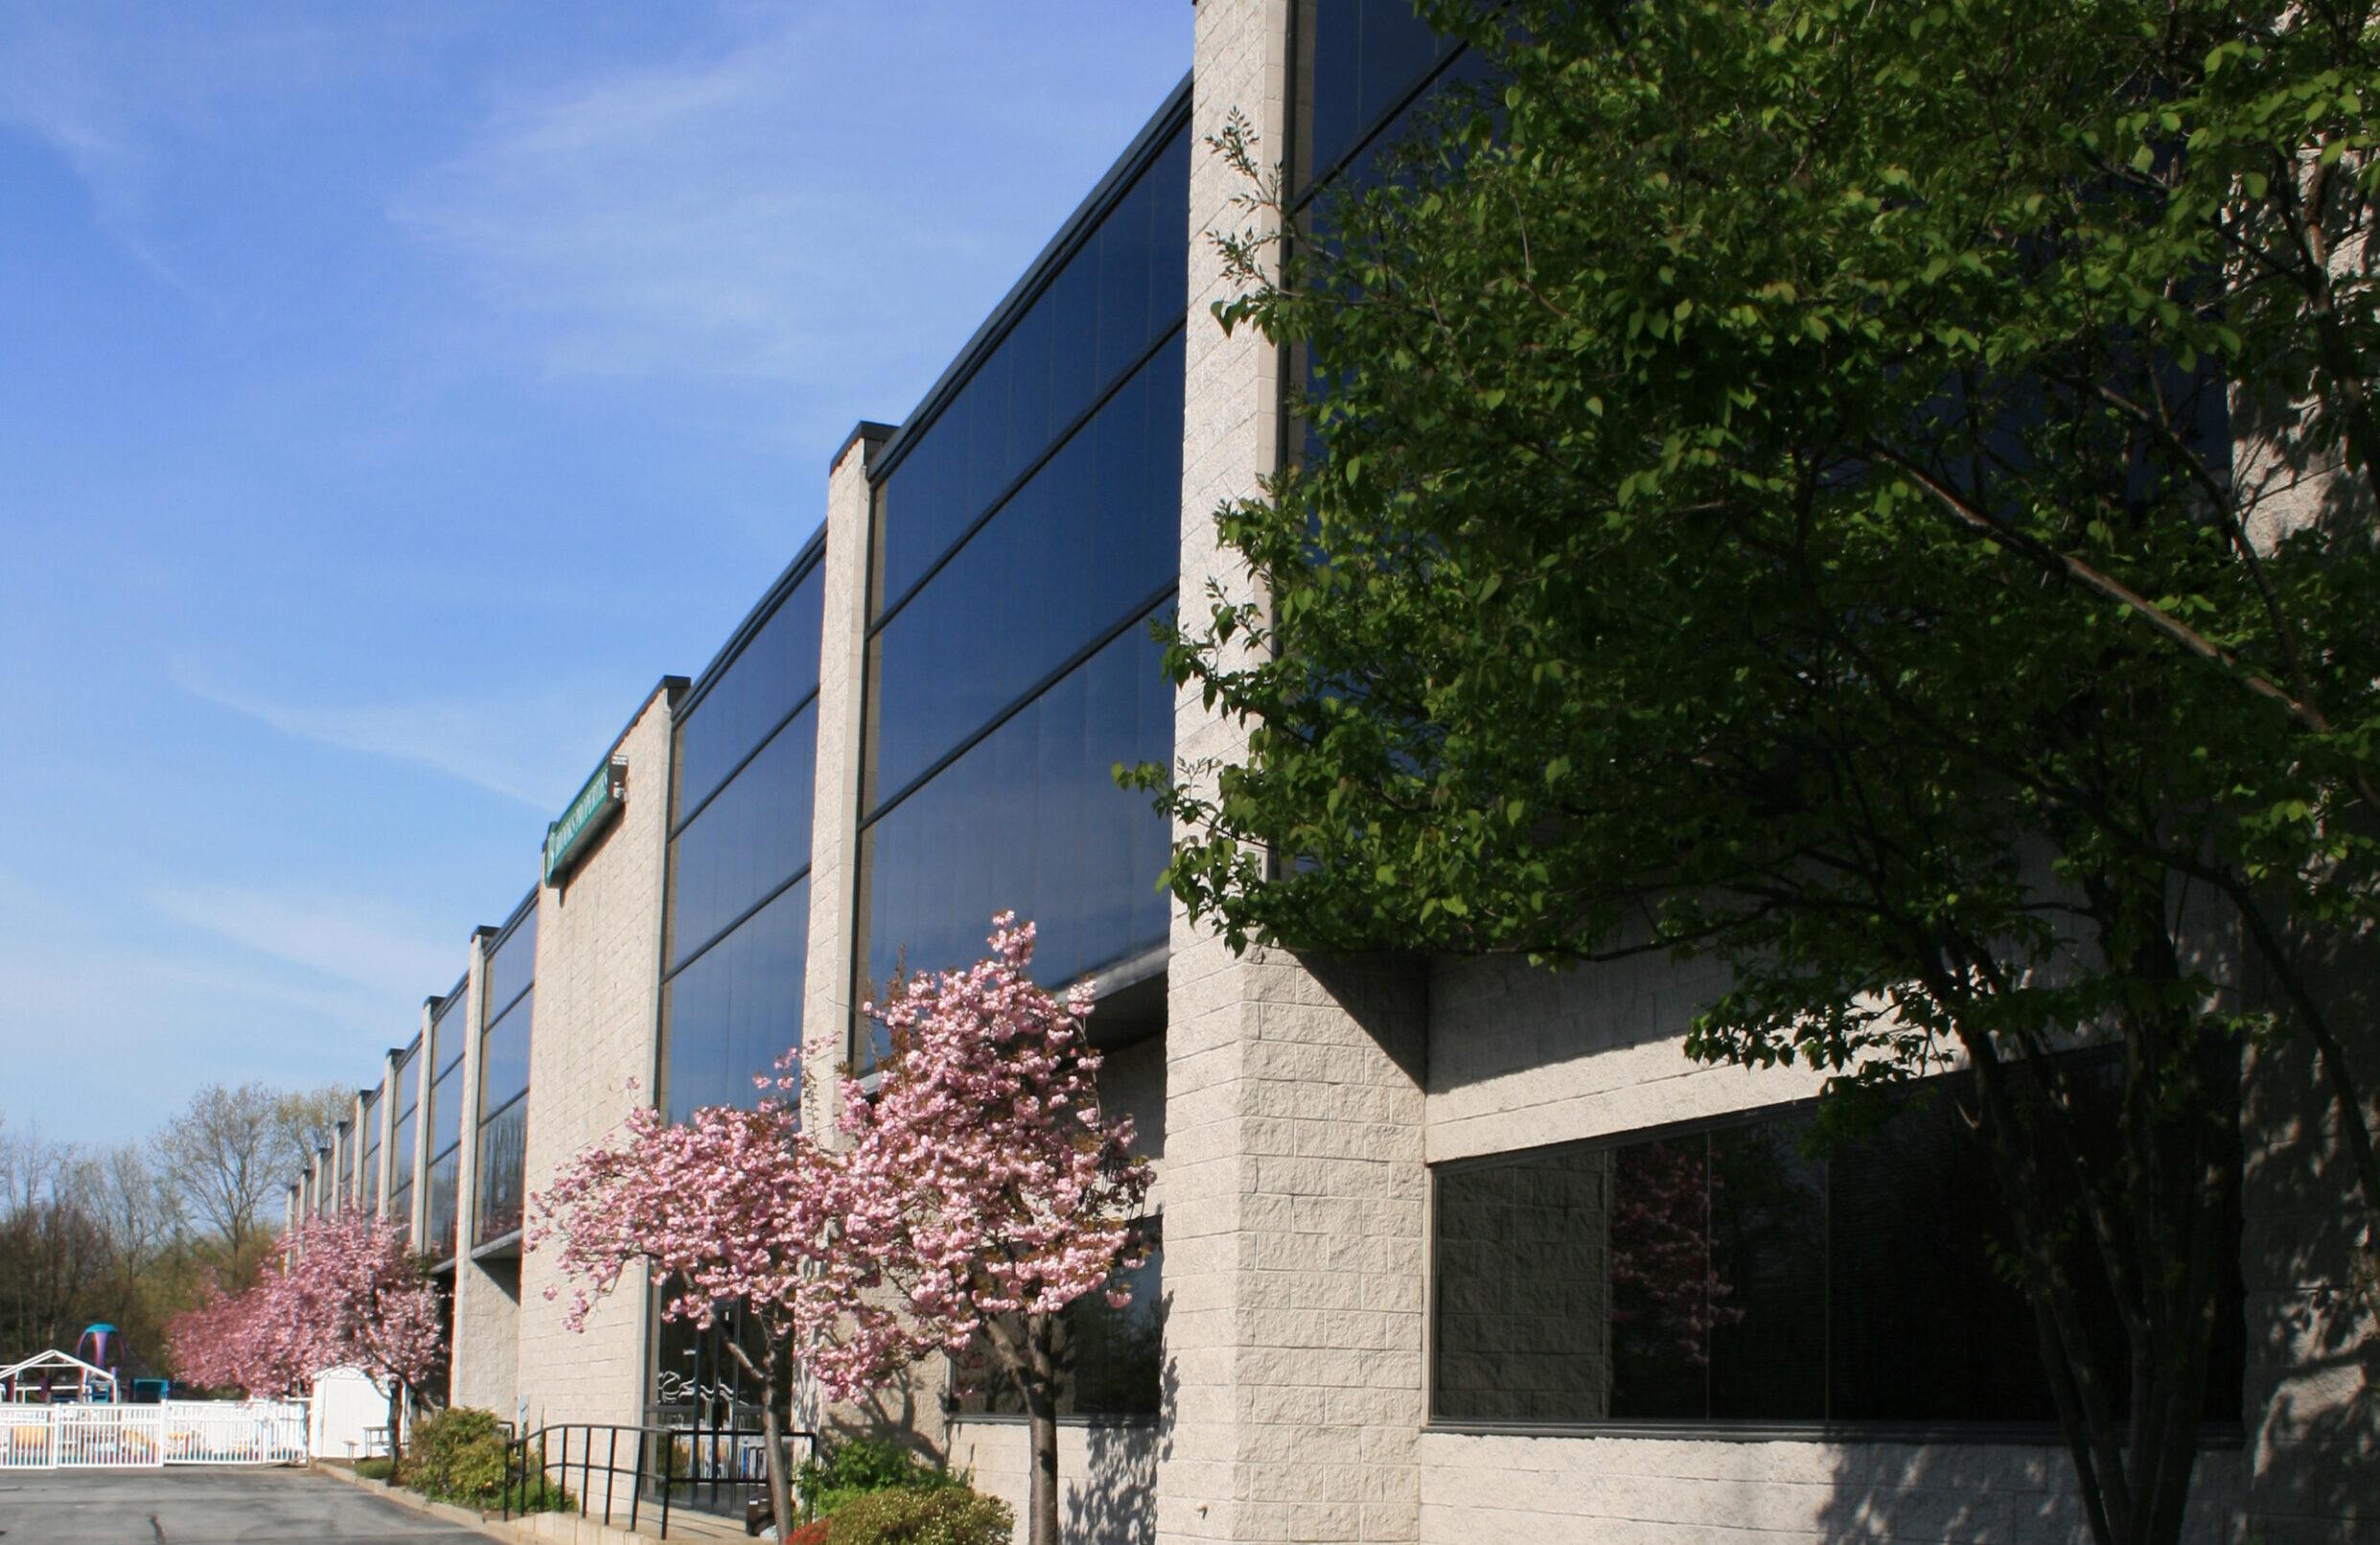 13 Branch Street, Methuen, MA cropped for website 2021